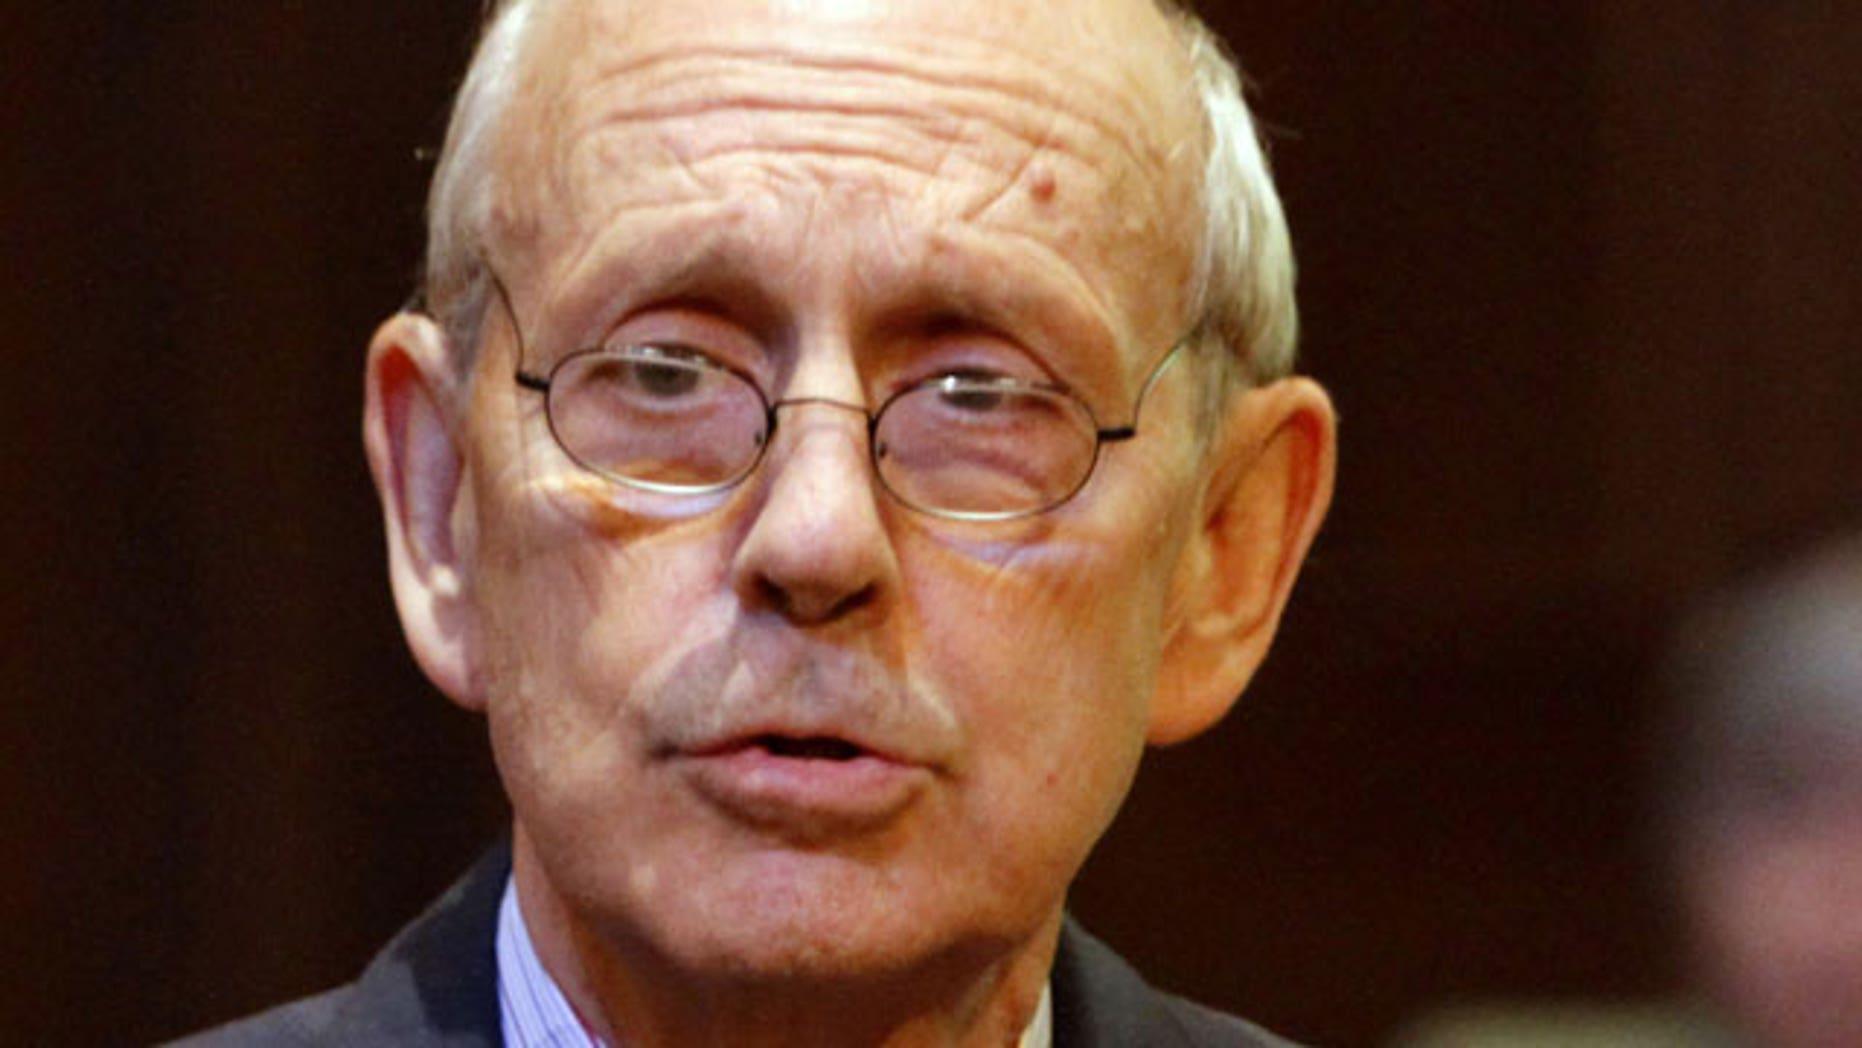 In this Oct. 6, 2011 file photo, Supreme Court Justice Stephen Breyer in Richmond, Va.